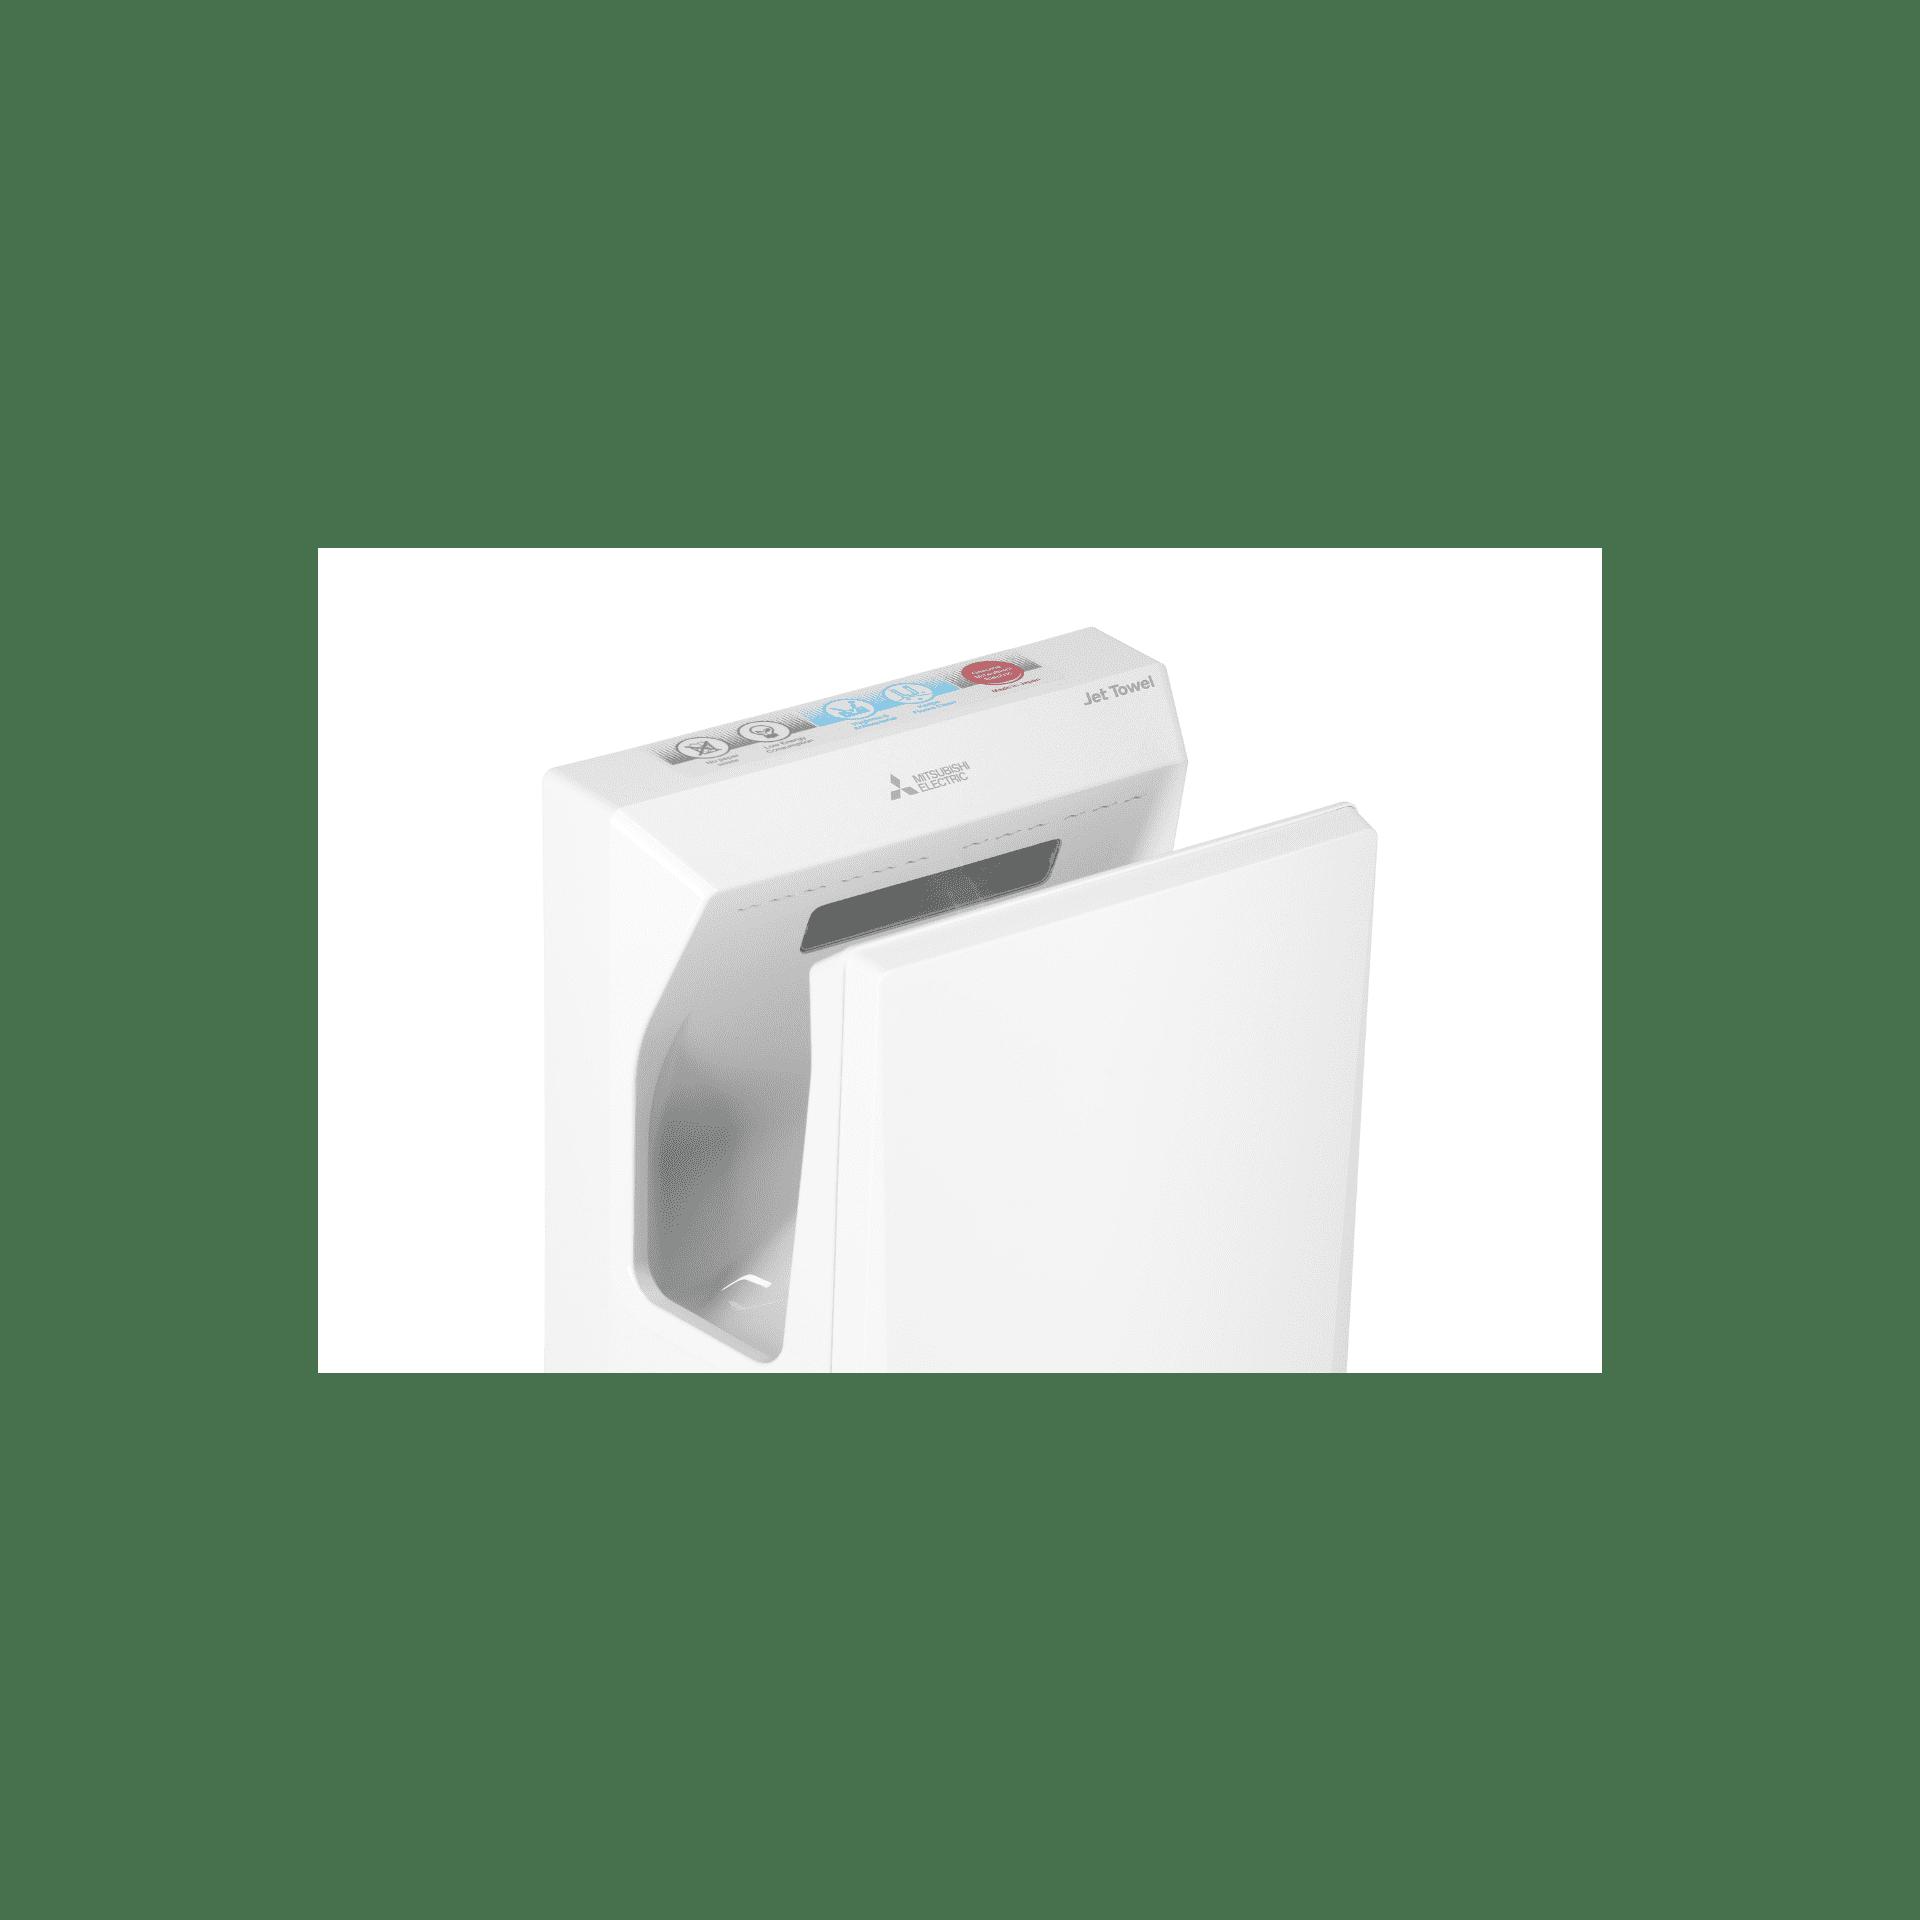 hand w mitsubishi lite unheated whiteqm jet ne smart white dryer towel products jt